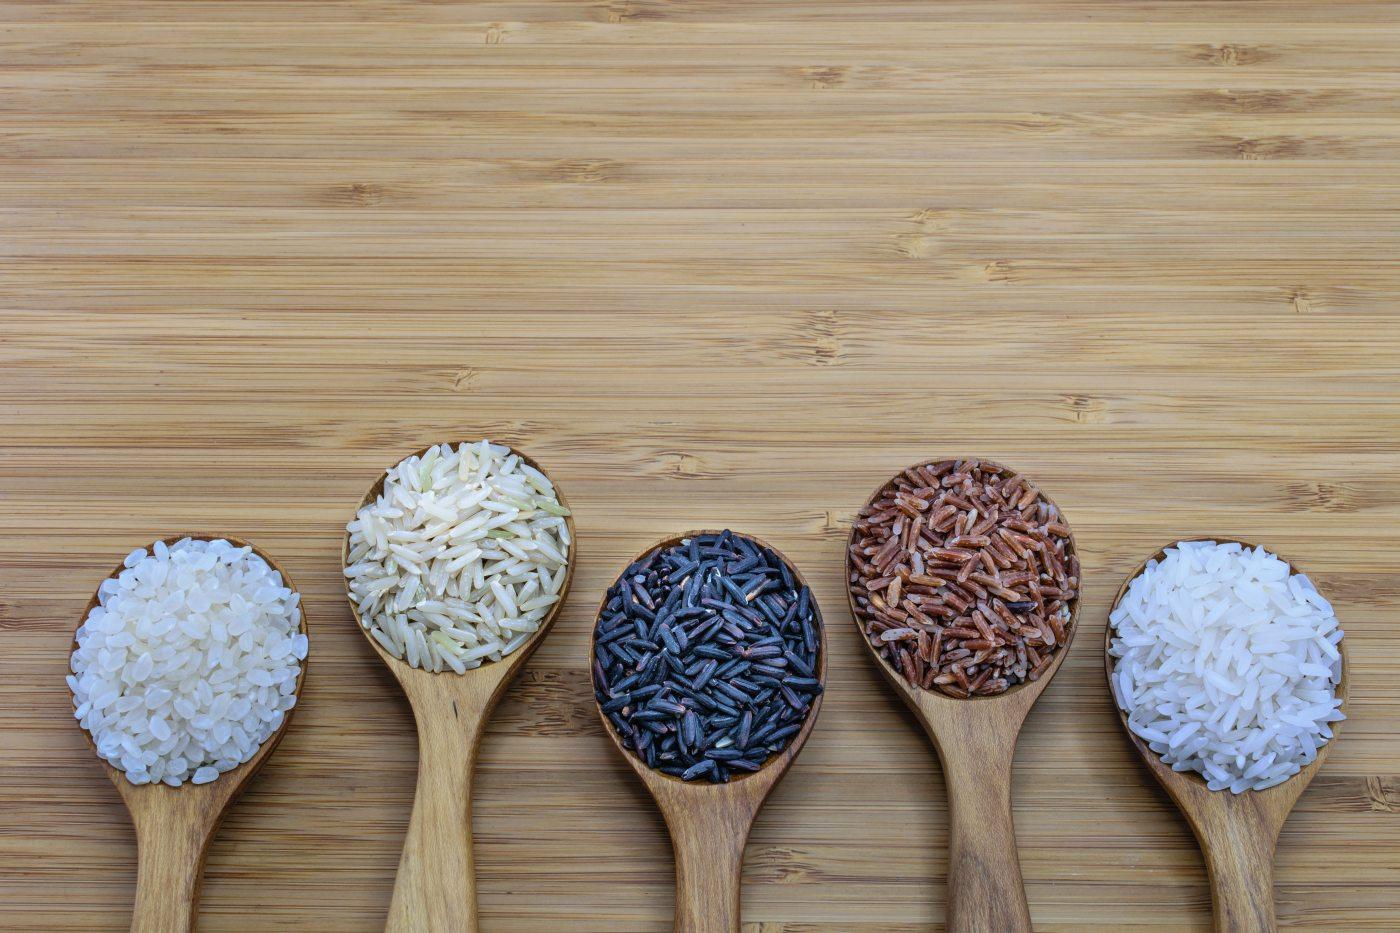 Riža - najbolja je integralna